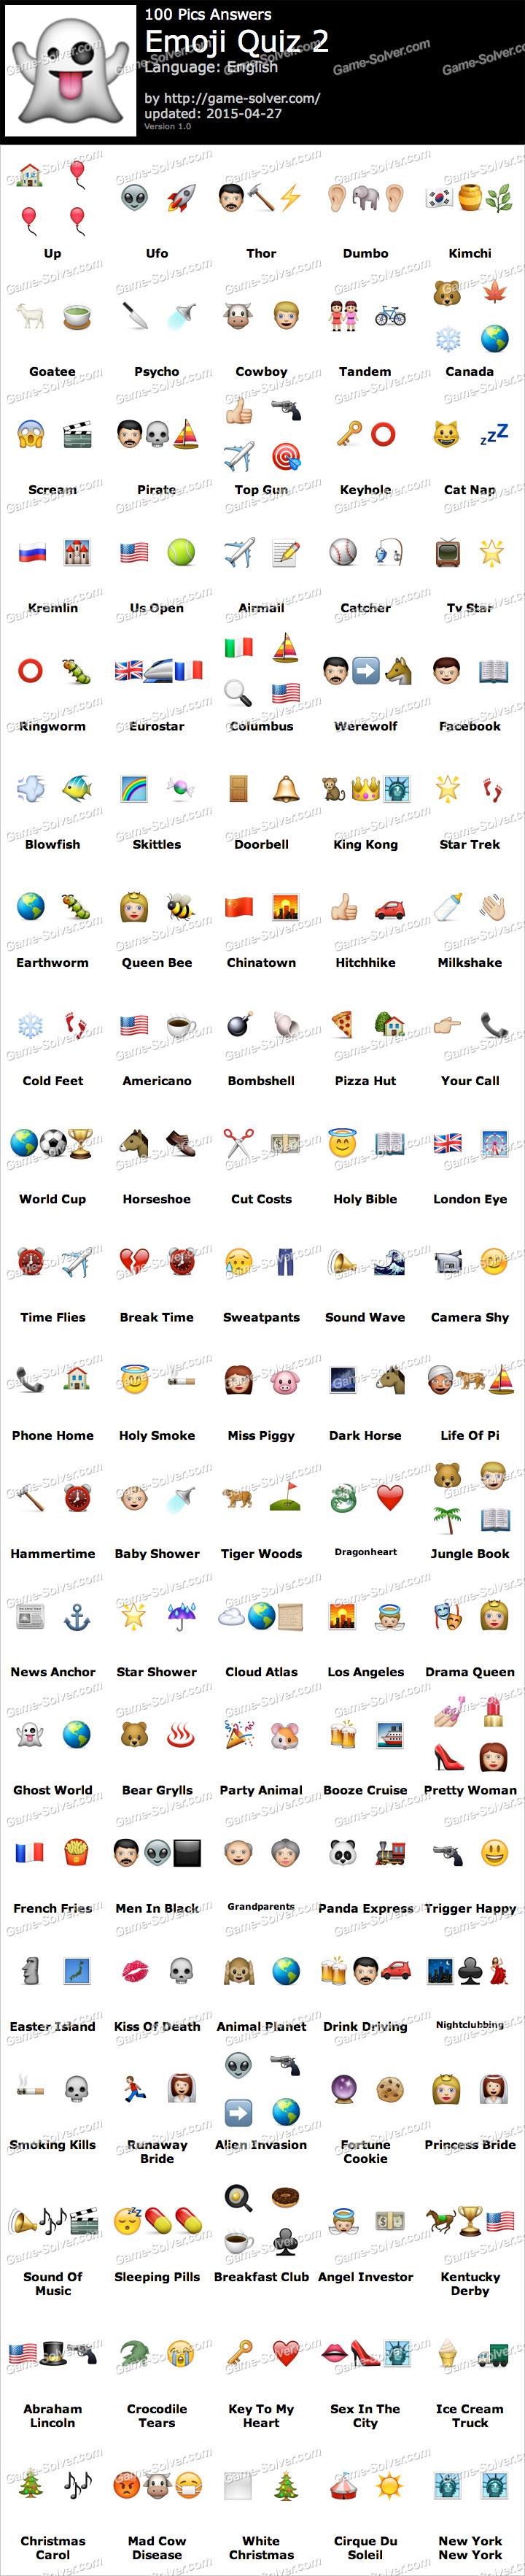 Connu 100 Pics Emoji Quiz 2 - Game Solver RX86